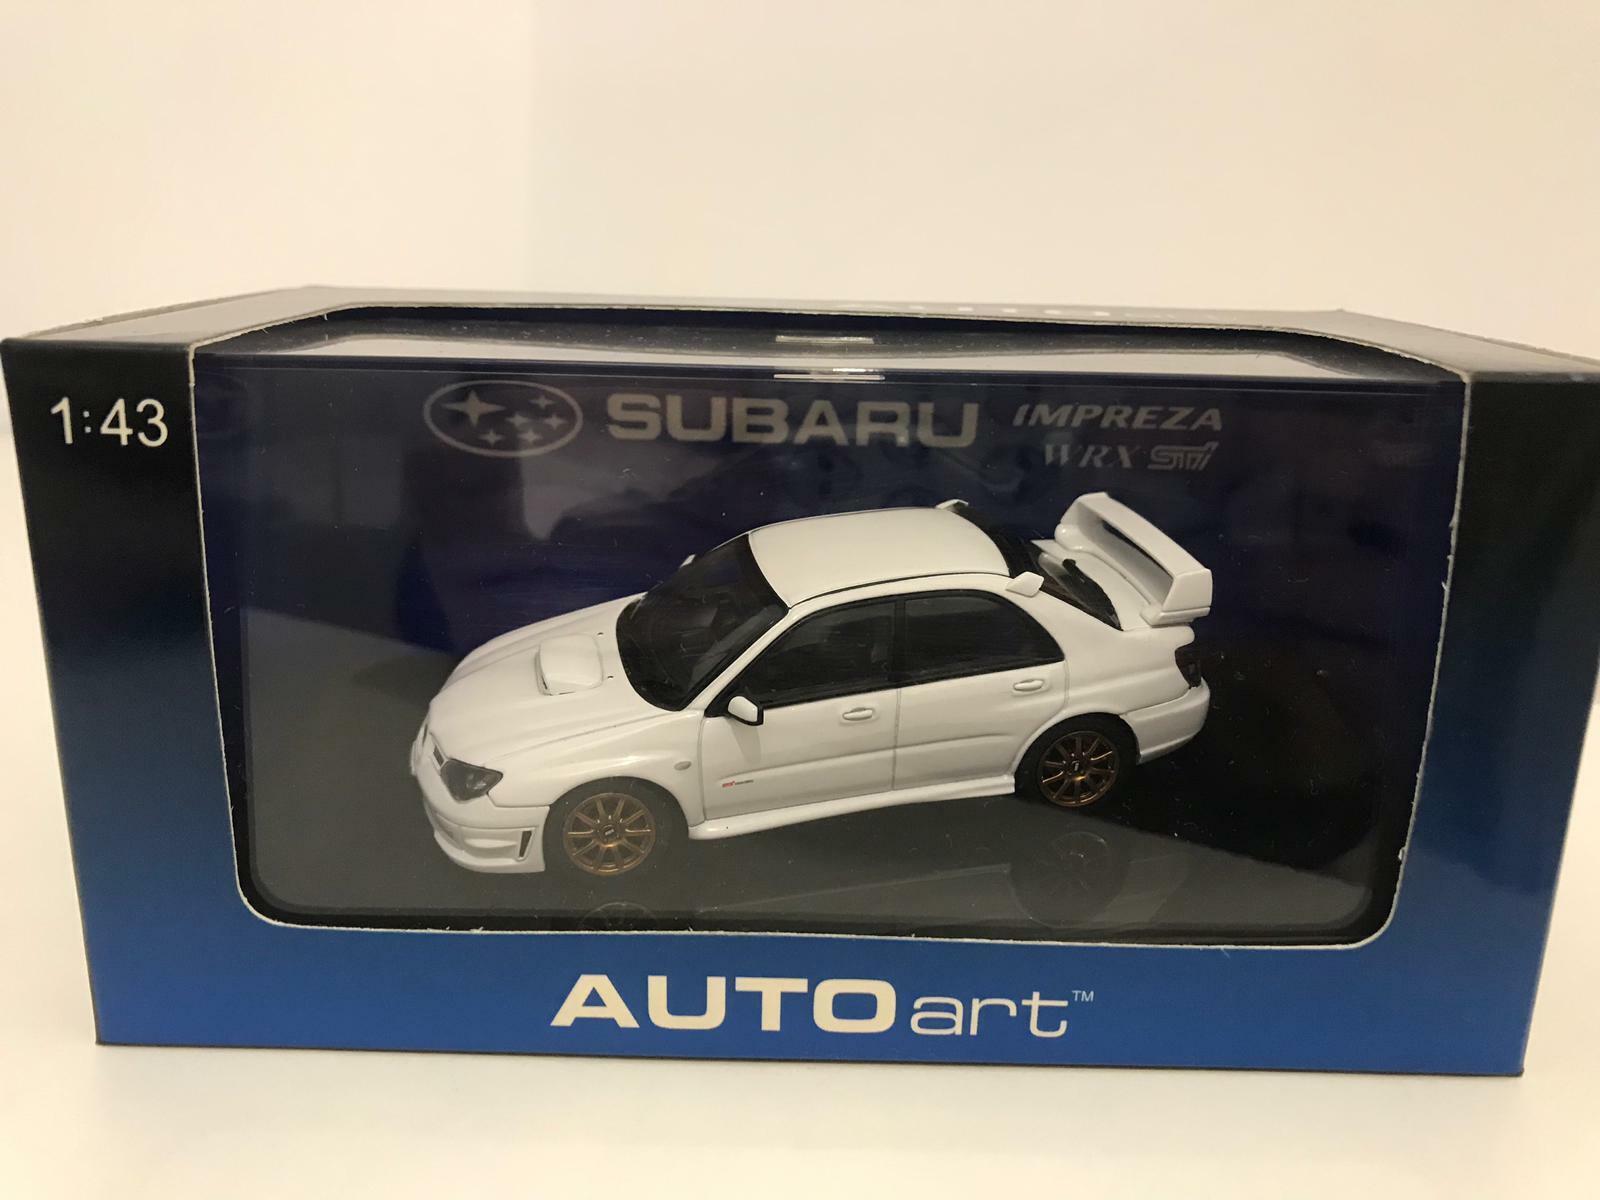 AutoArt Subaru Impreza WRX STI 2006 blanc 1 43 58682 RARE